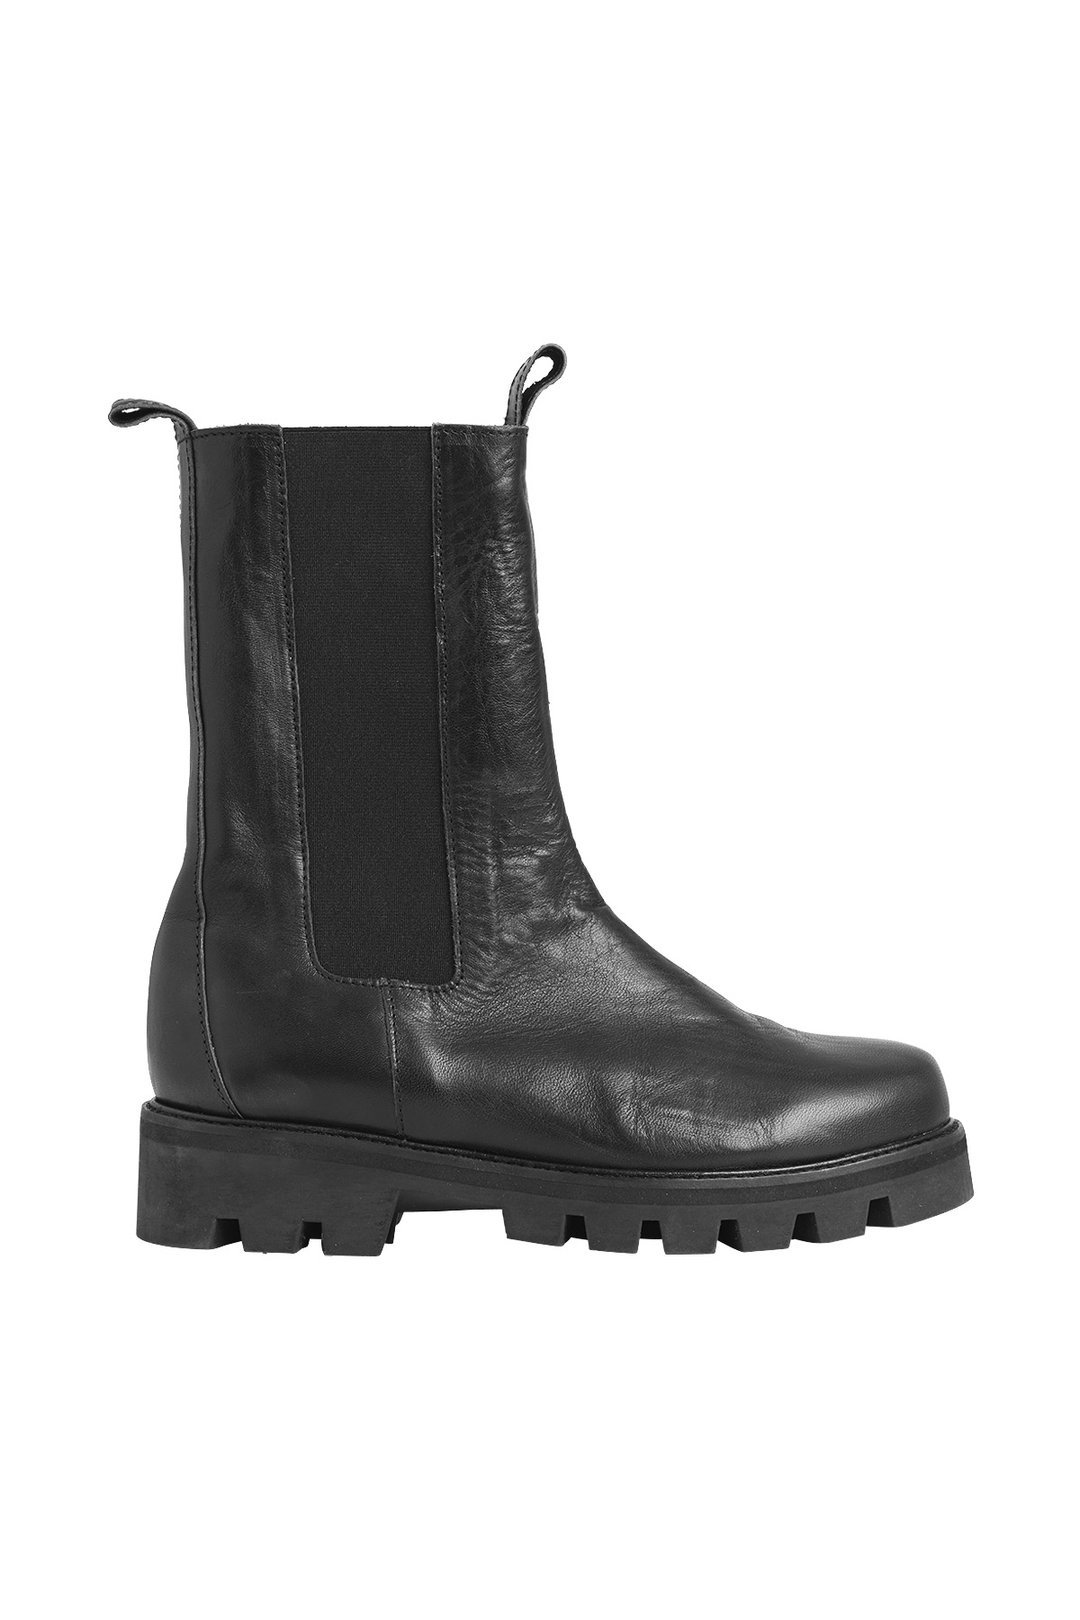 Rabens Saloner Faith Leather Chealsea Boot - black